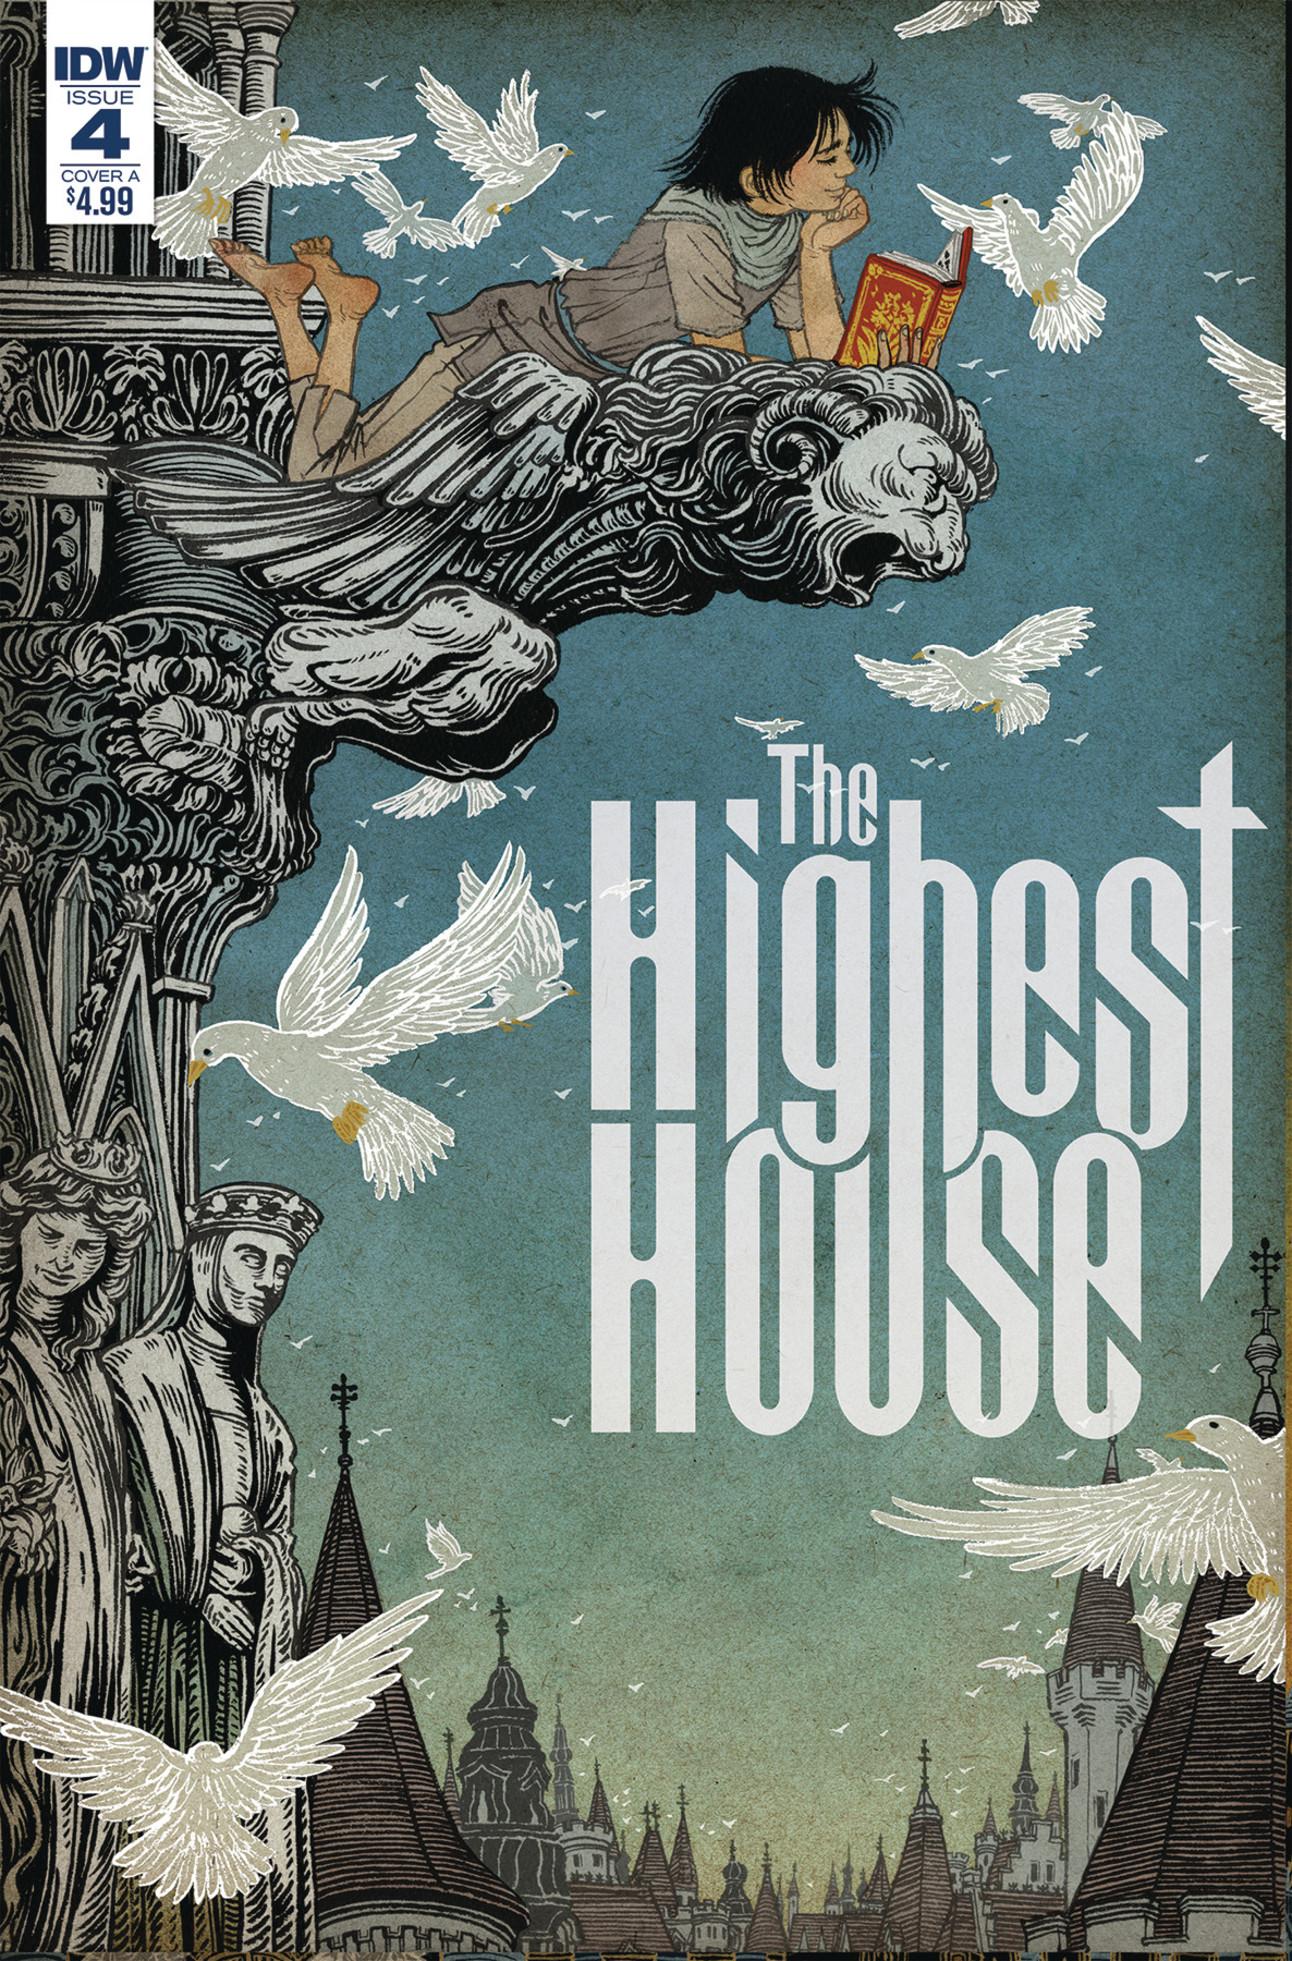 idw_highest_house_4_cover.jpg